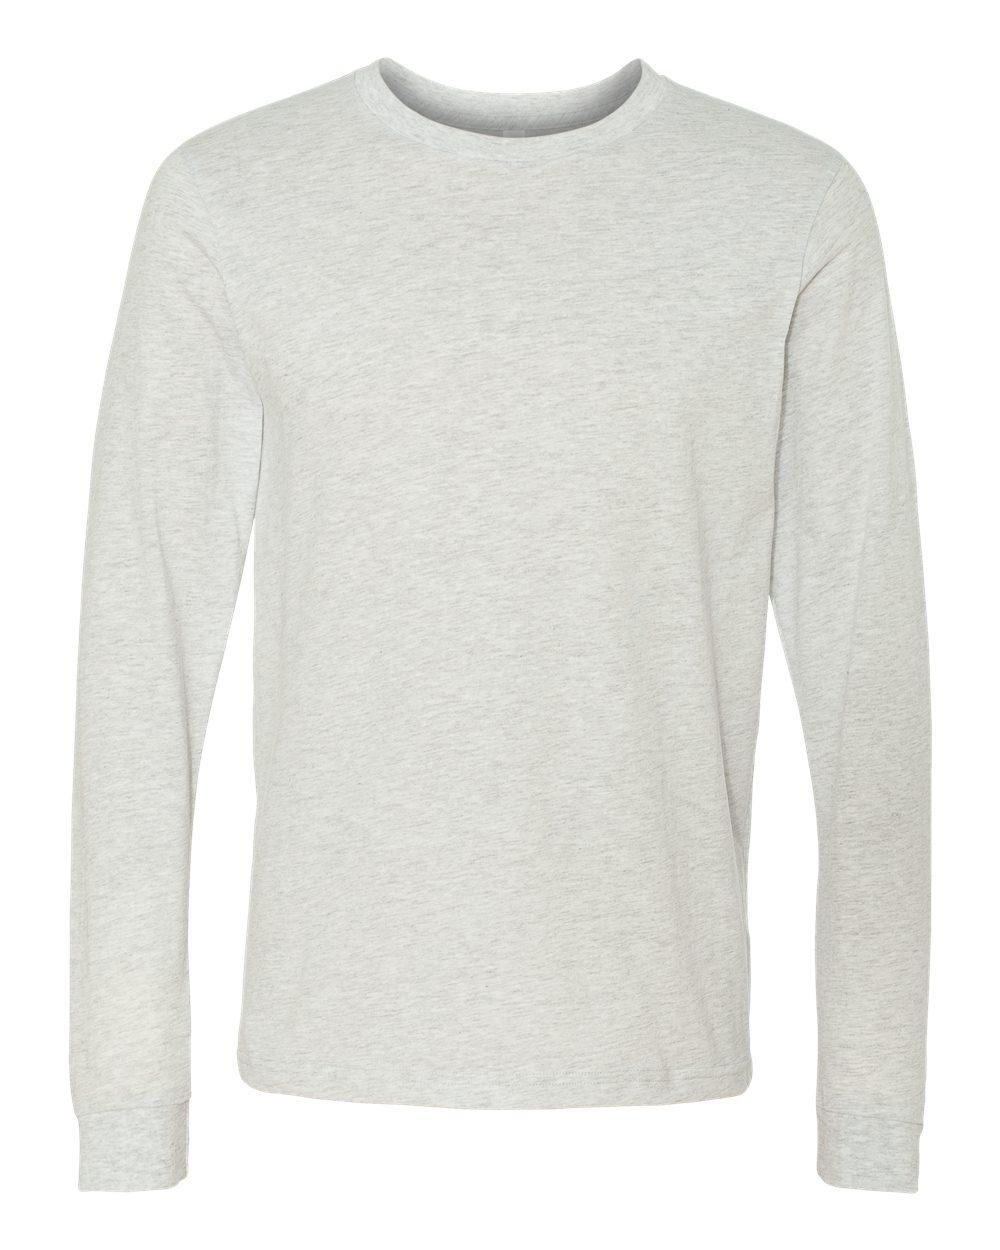 Bella-Canvas-Mens-Blank-Top-Long-Sleeve-Jersey-Tee-T-Shirt-3501-up-to-3XL thumbnail 6